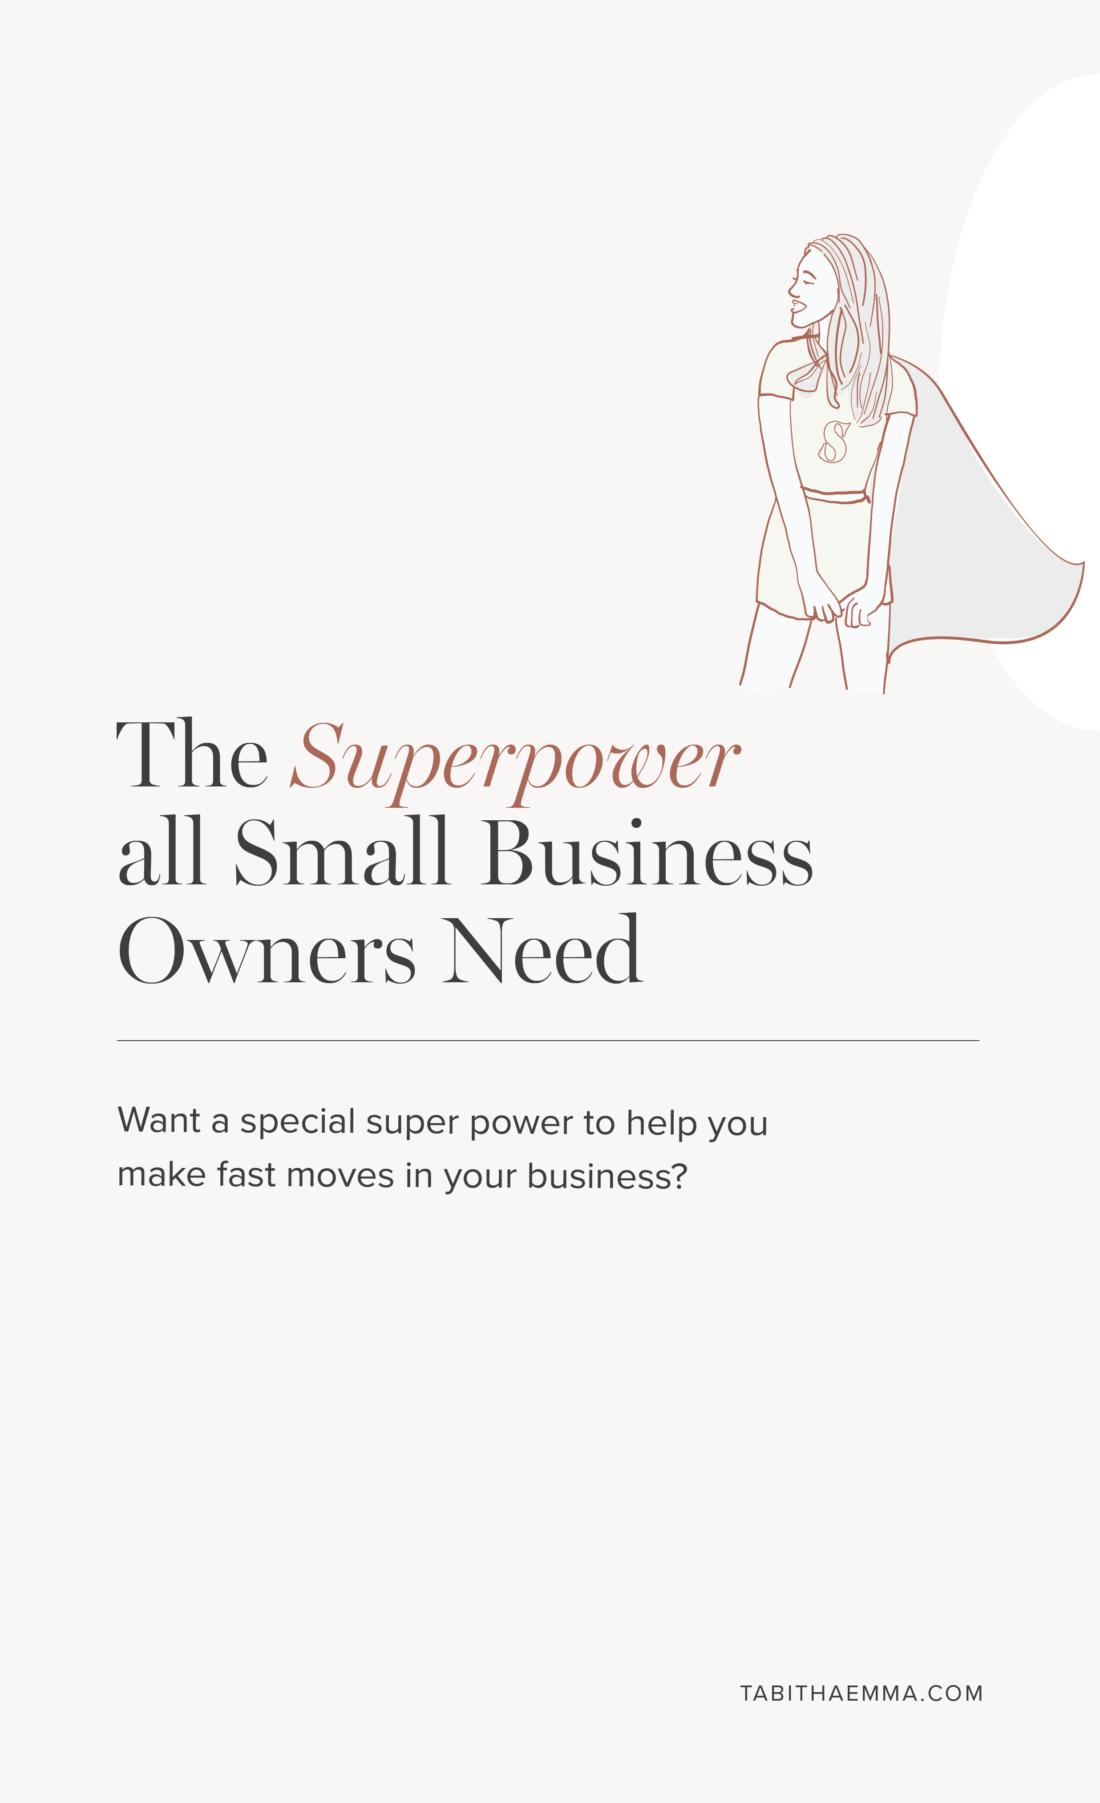 superpower skill graphic design business